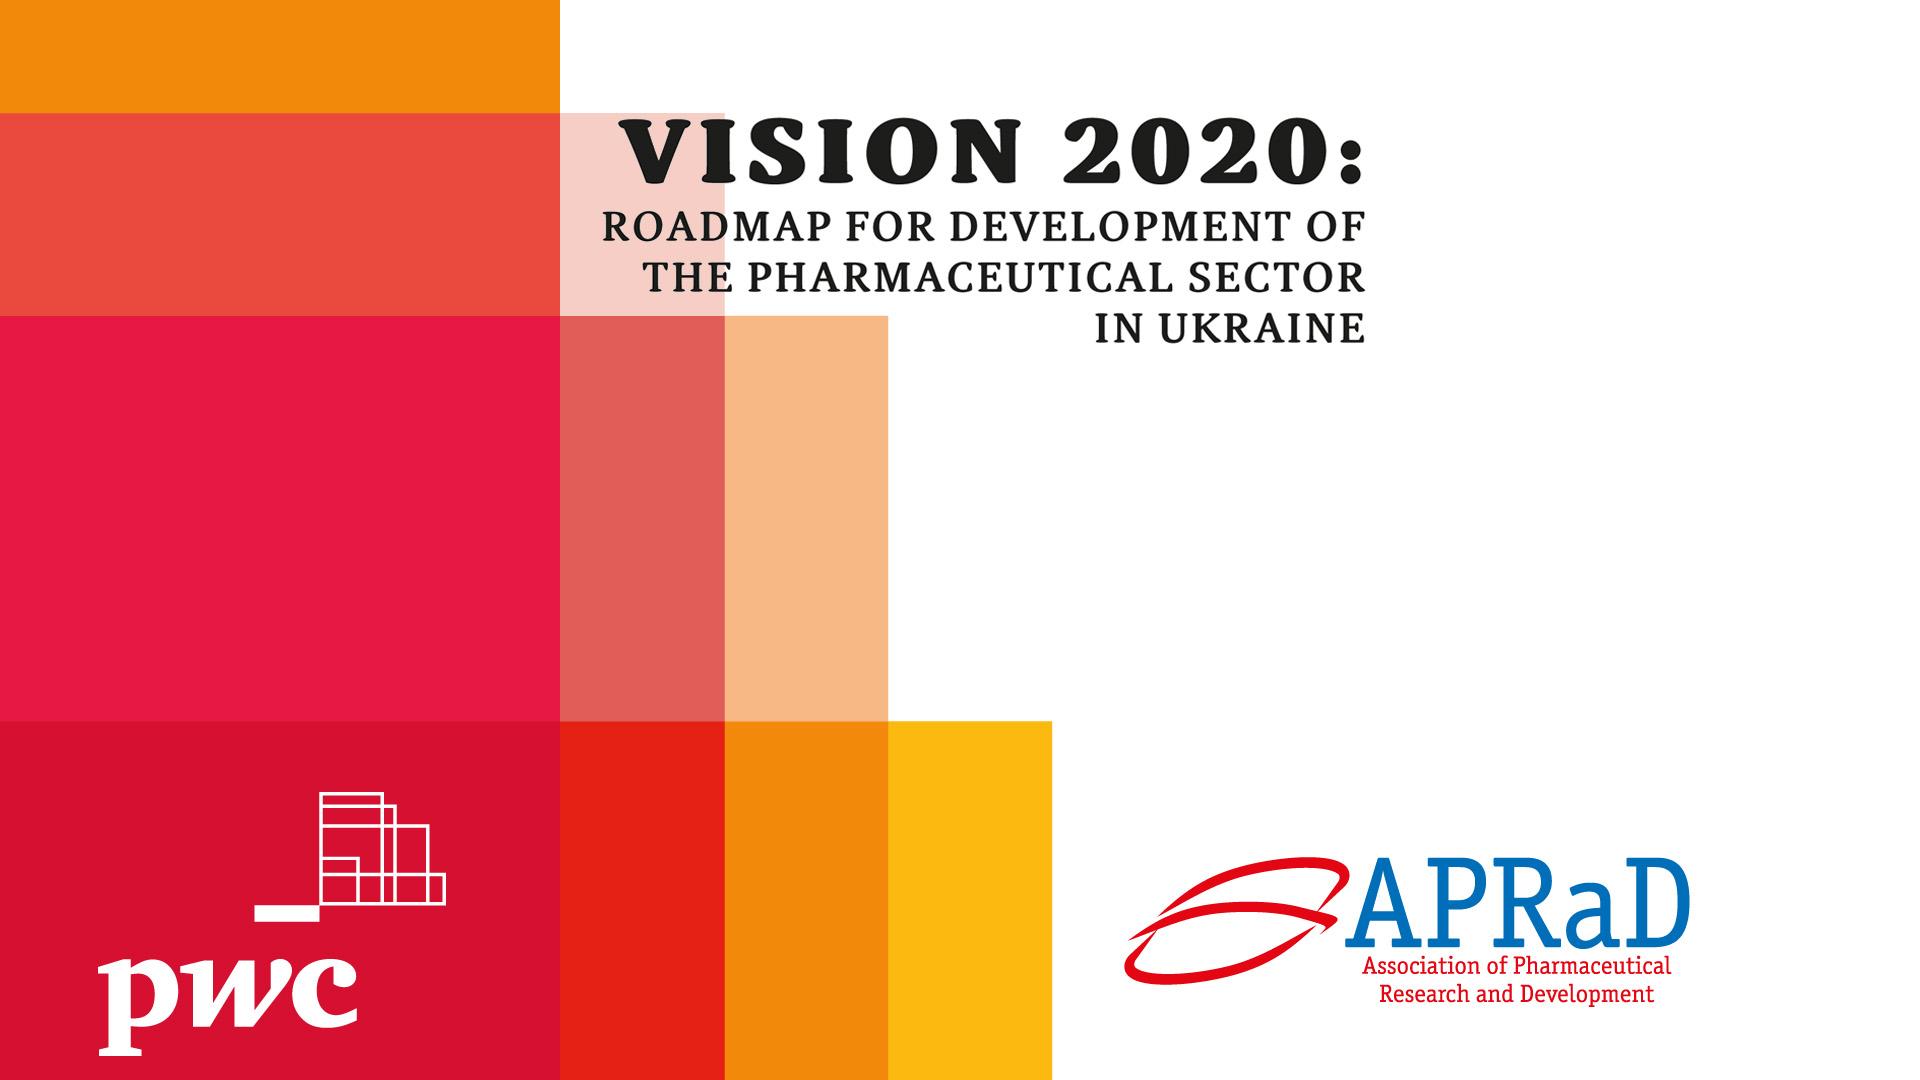 Vision 2020: Roadmap for Development of the Pharmaceutical Sector in Ukraine